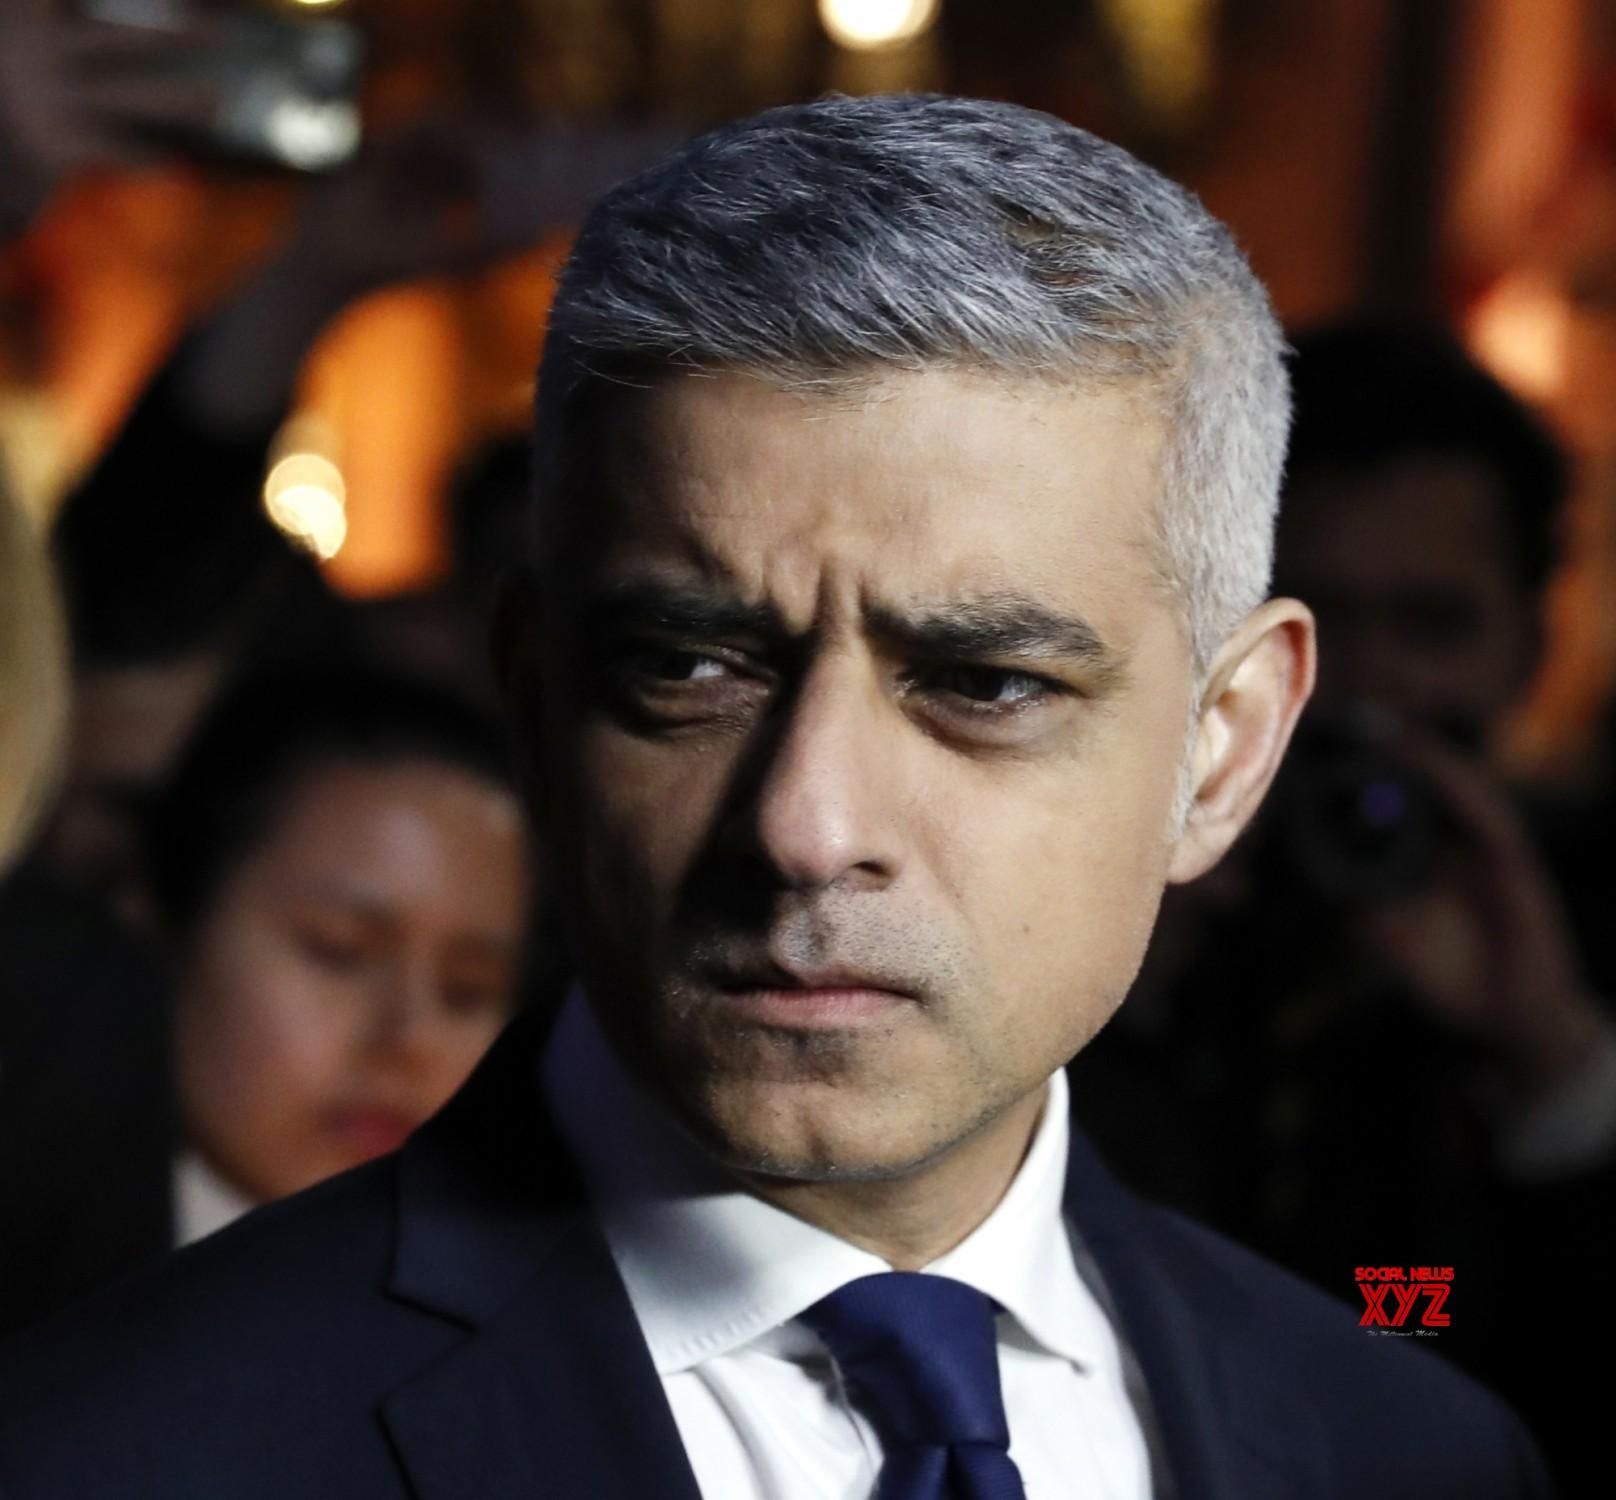 London records massive cases of coronavirus